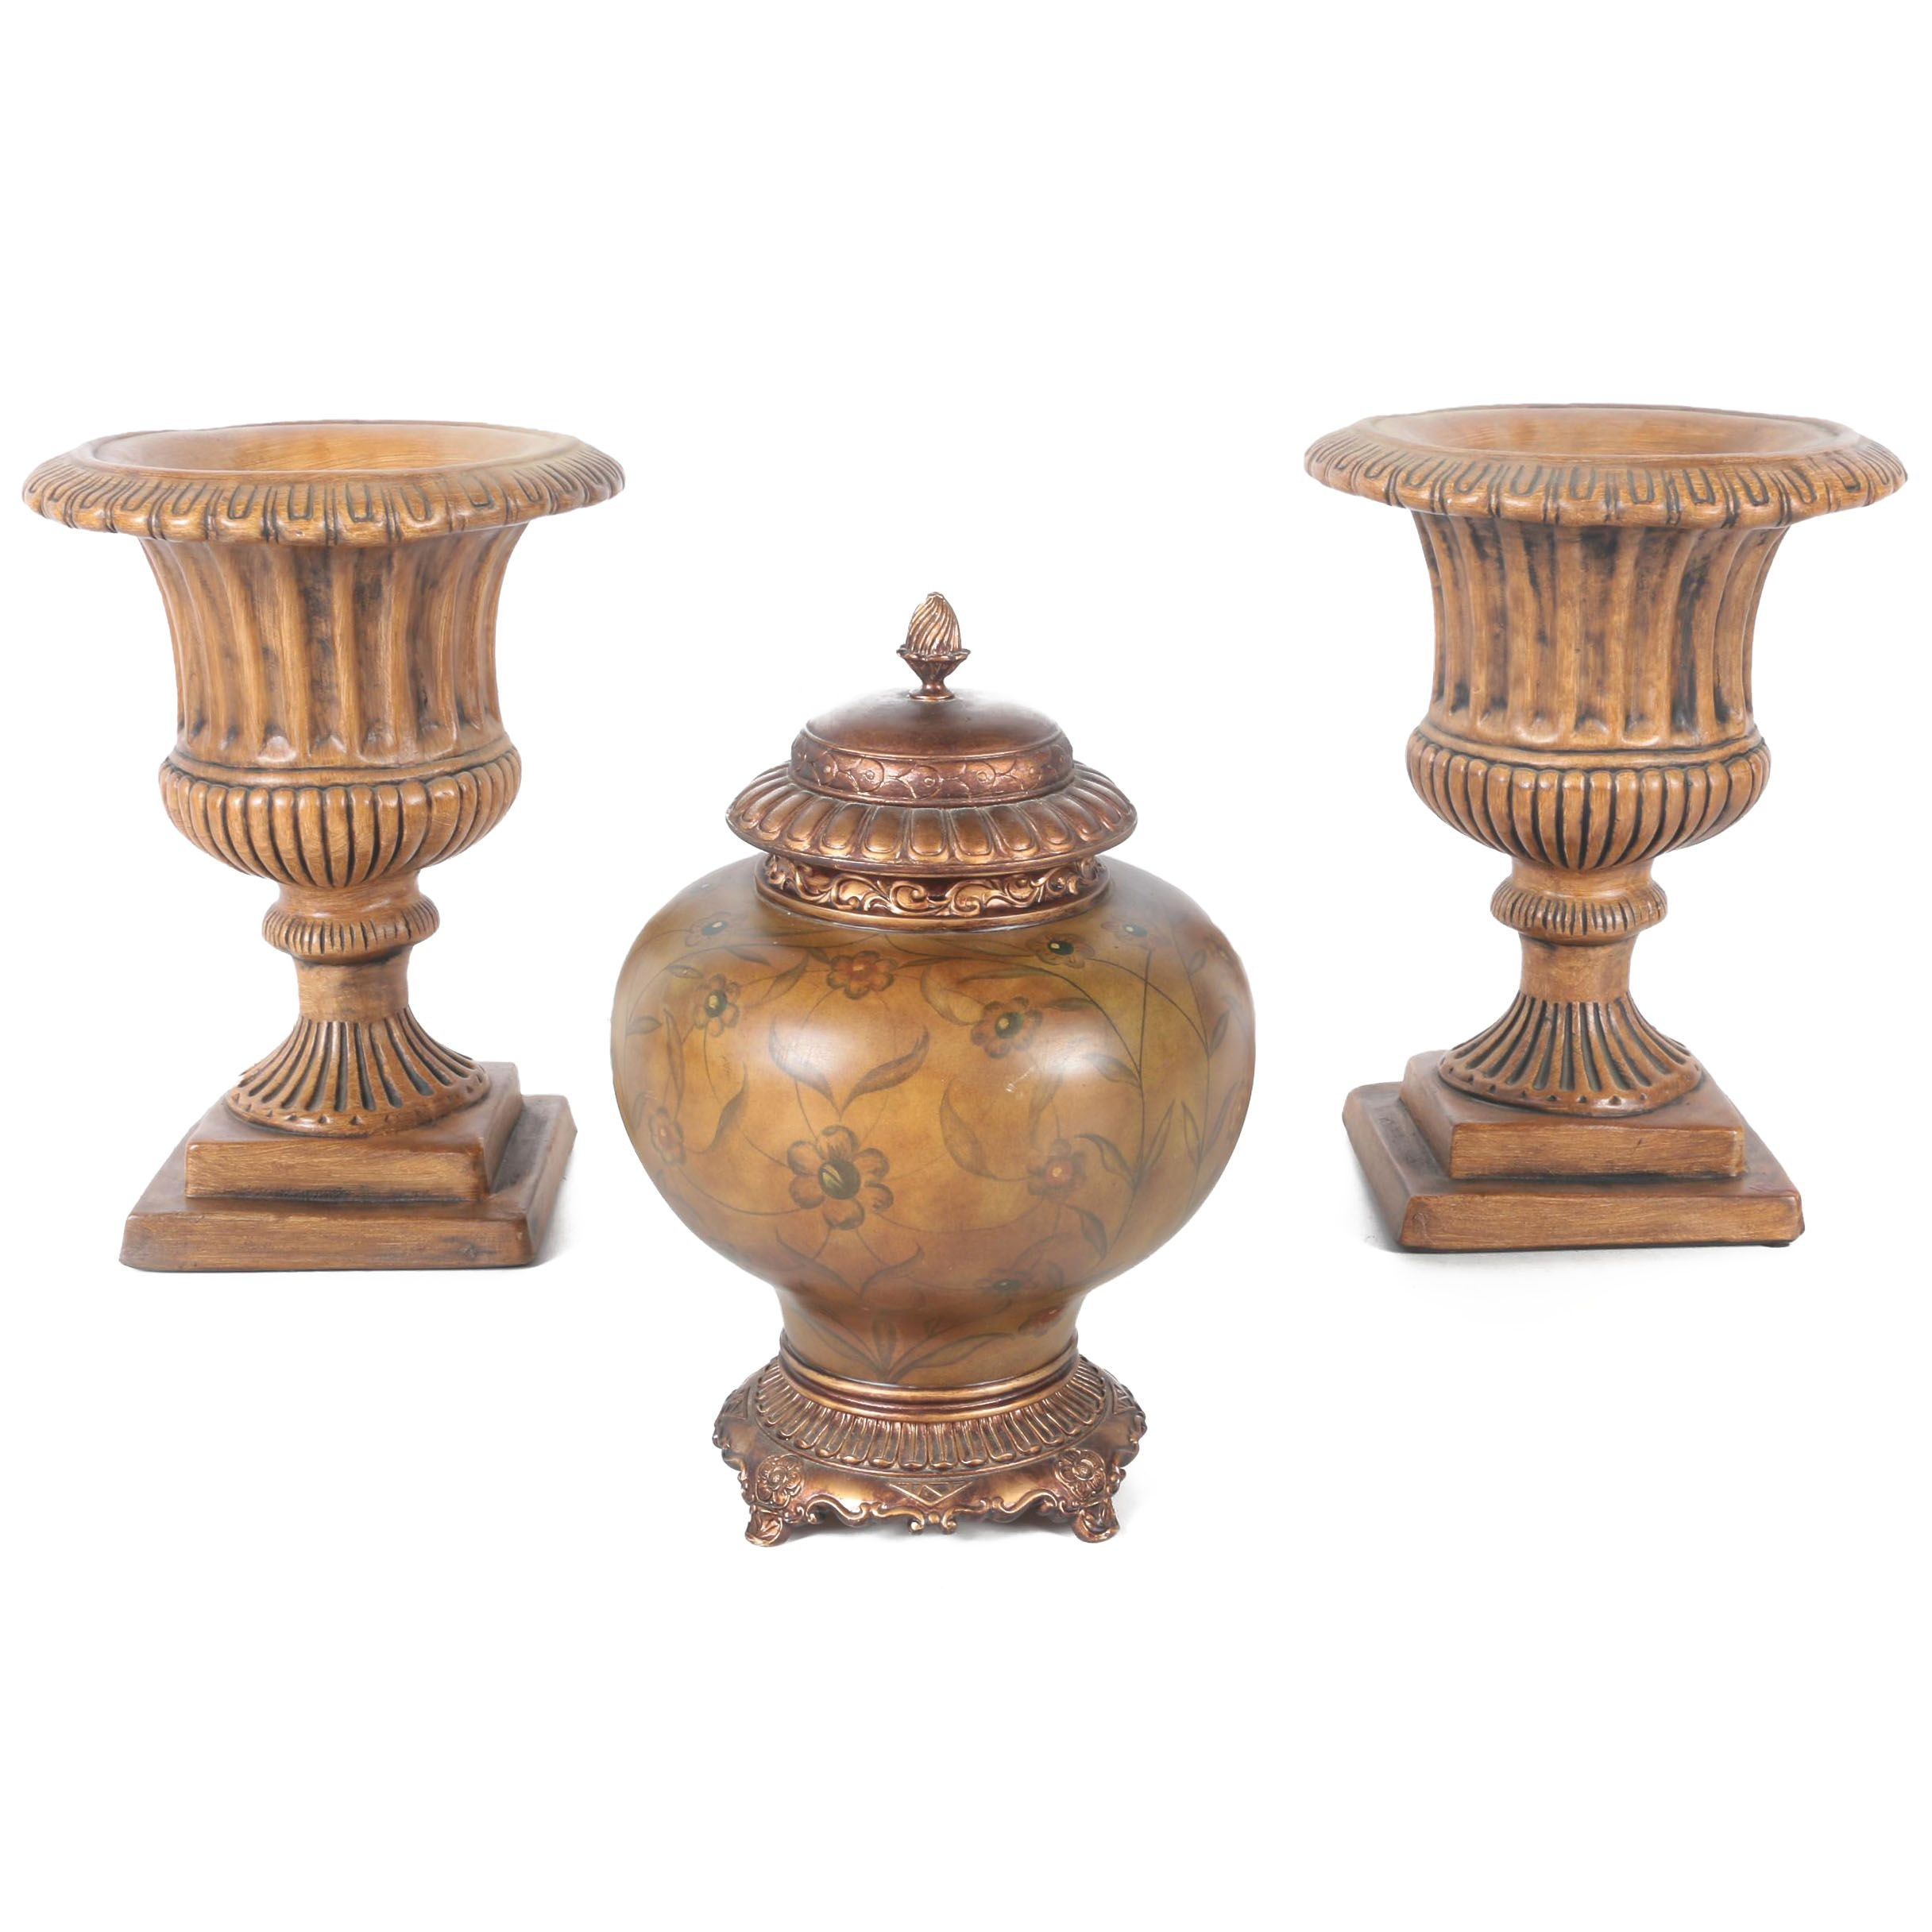 Beige Ceramic Planters and Urn